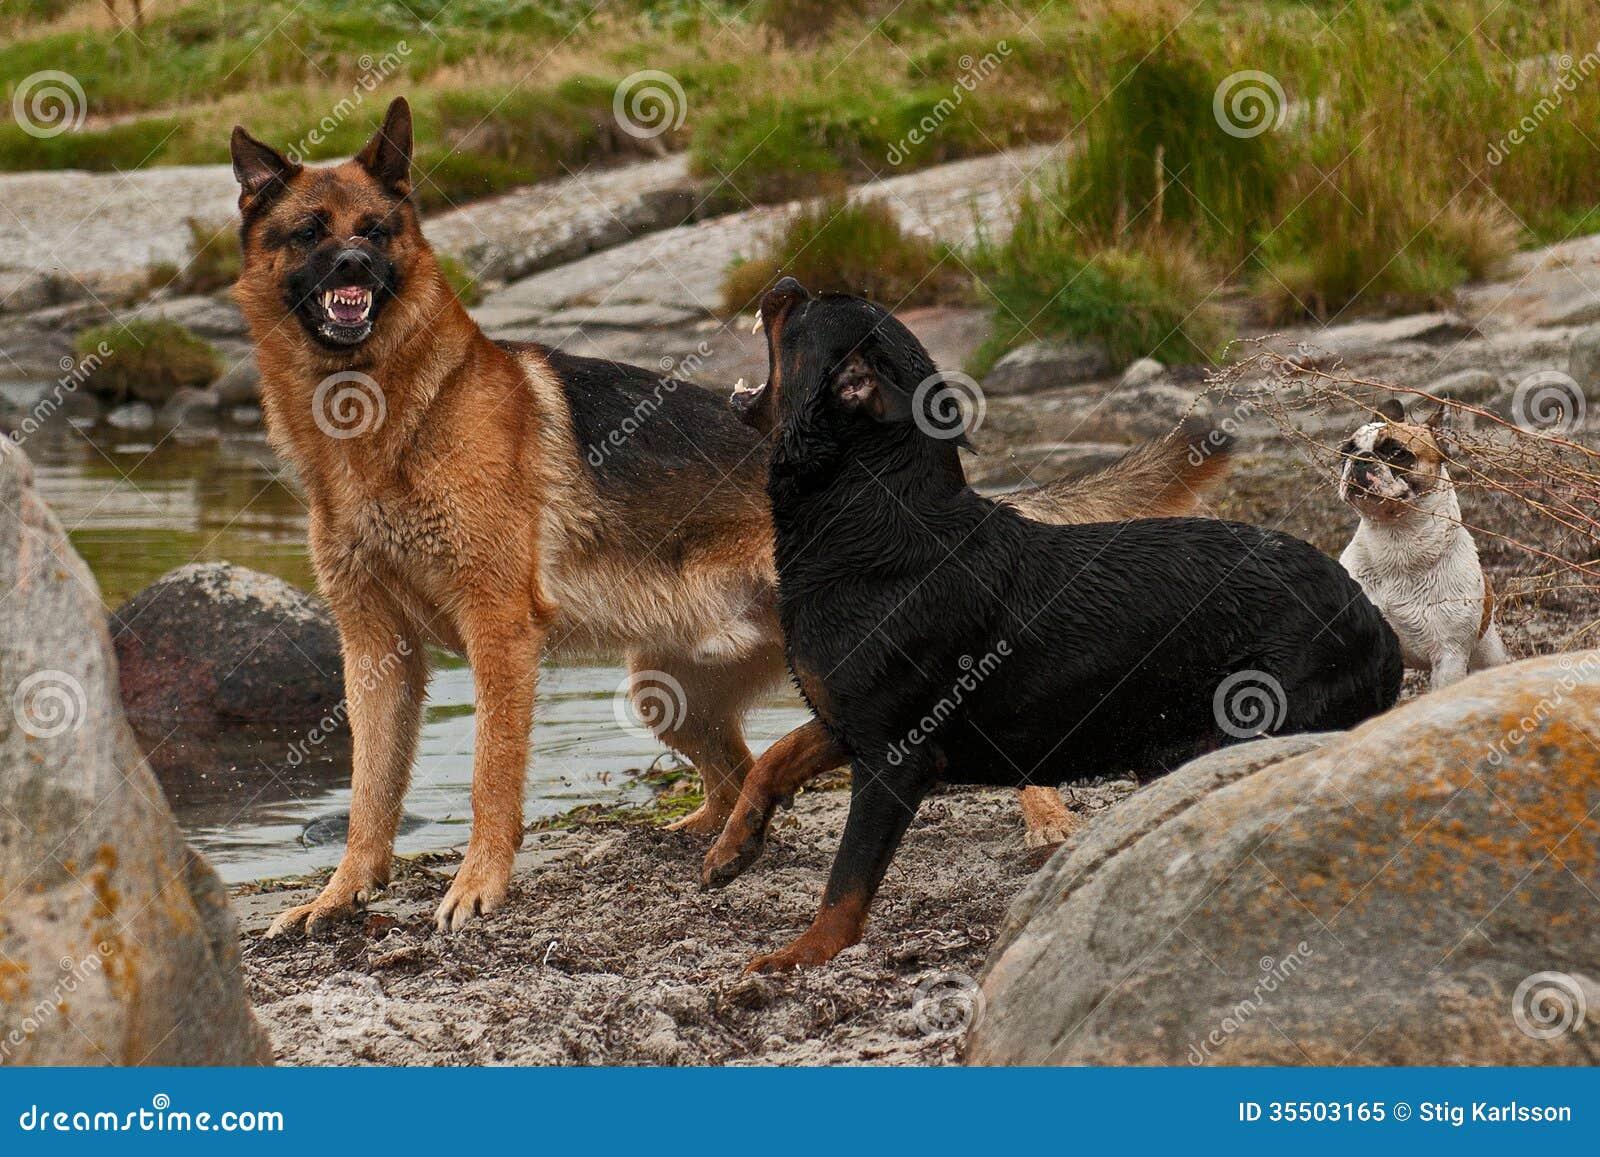 German Shepherd Dog Fight Male German Shepherd and